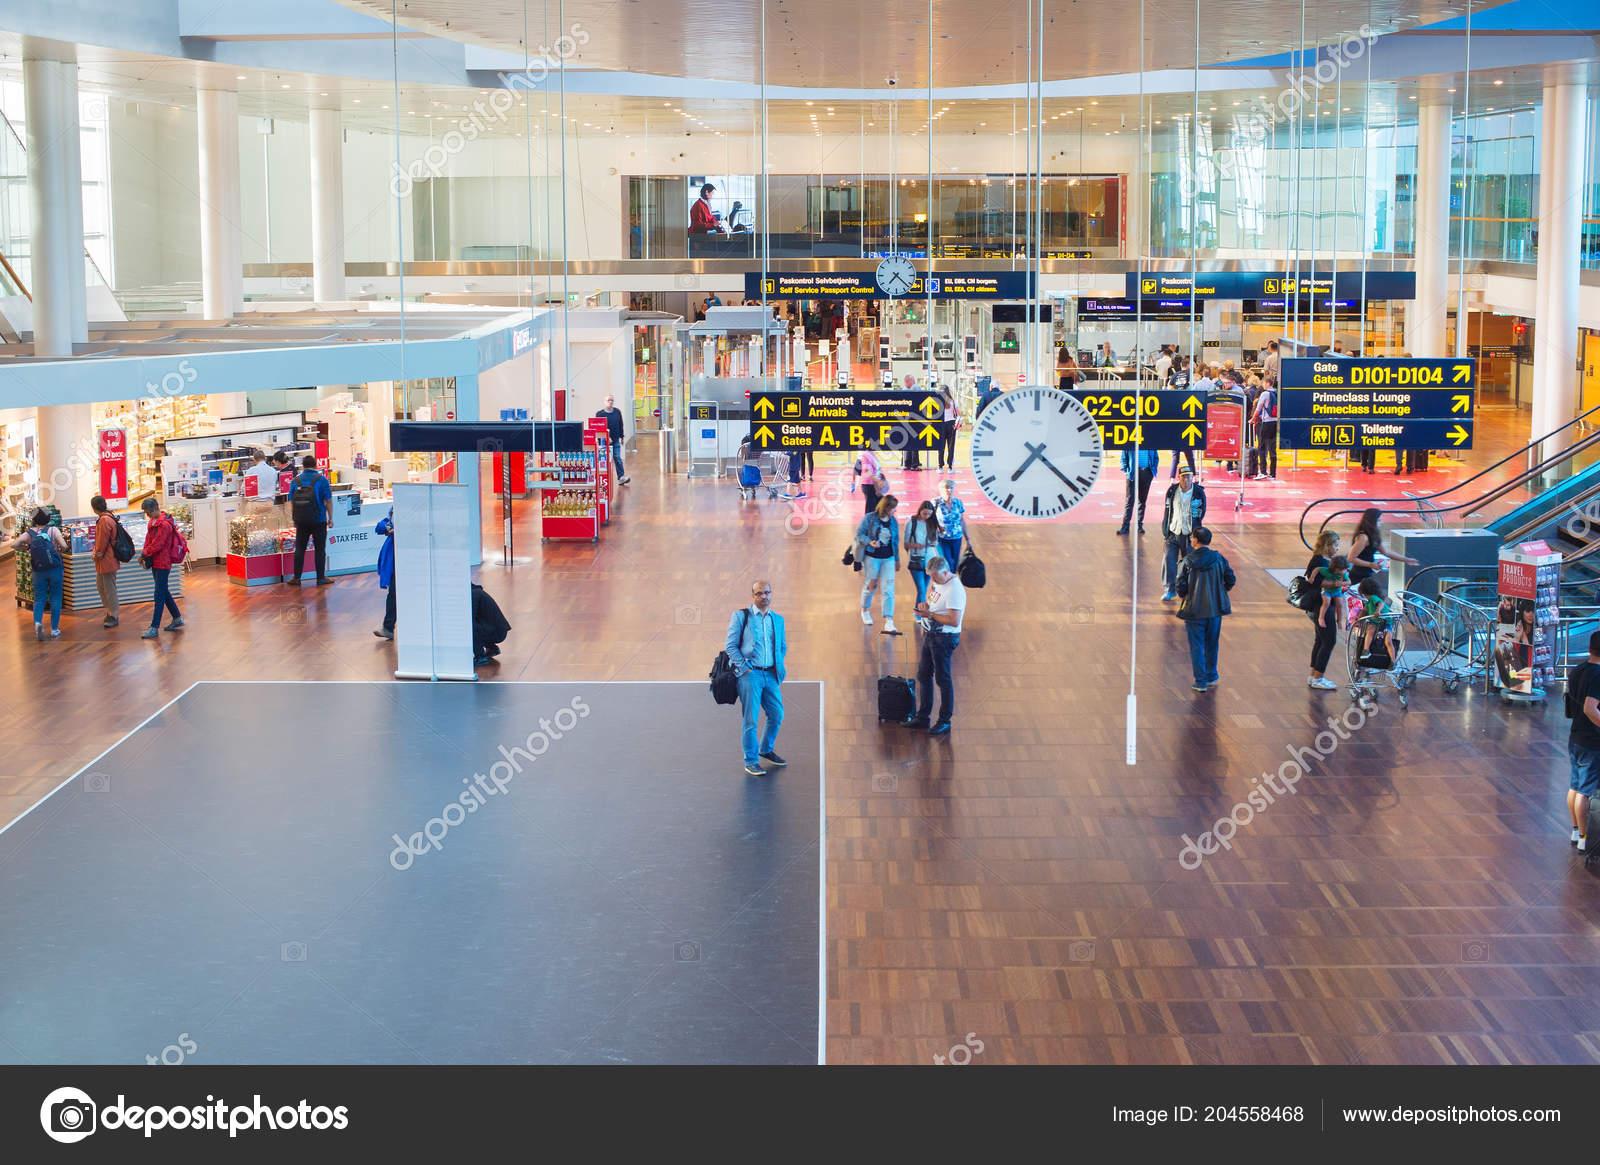 Lufthavn shop kastrup Copenhagen Airport